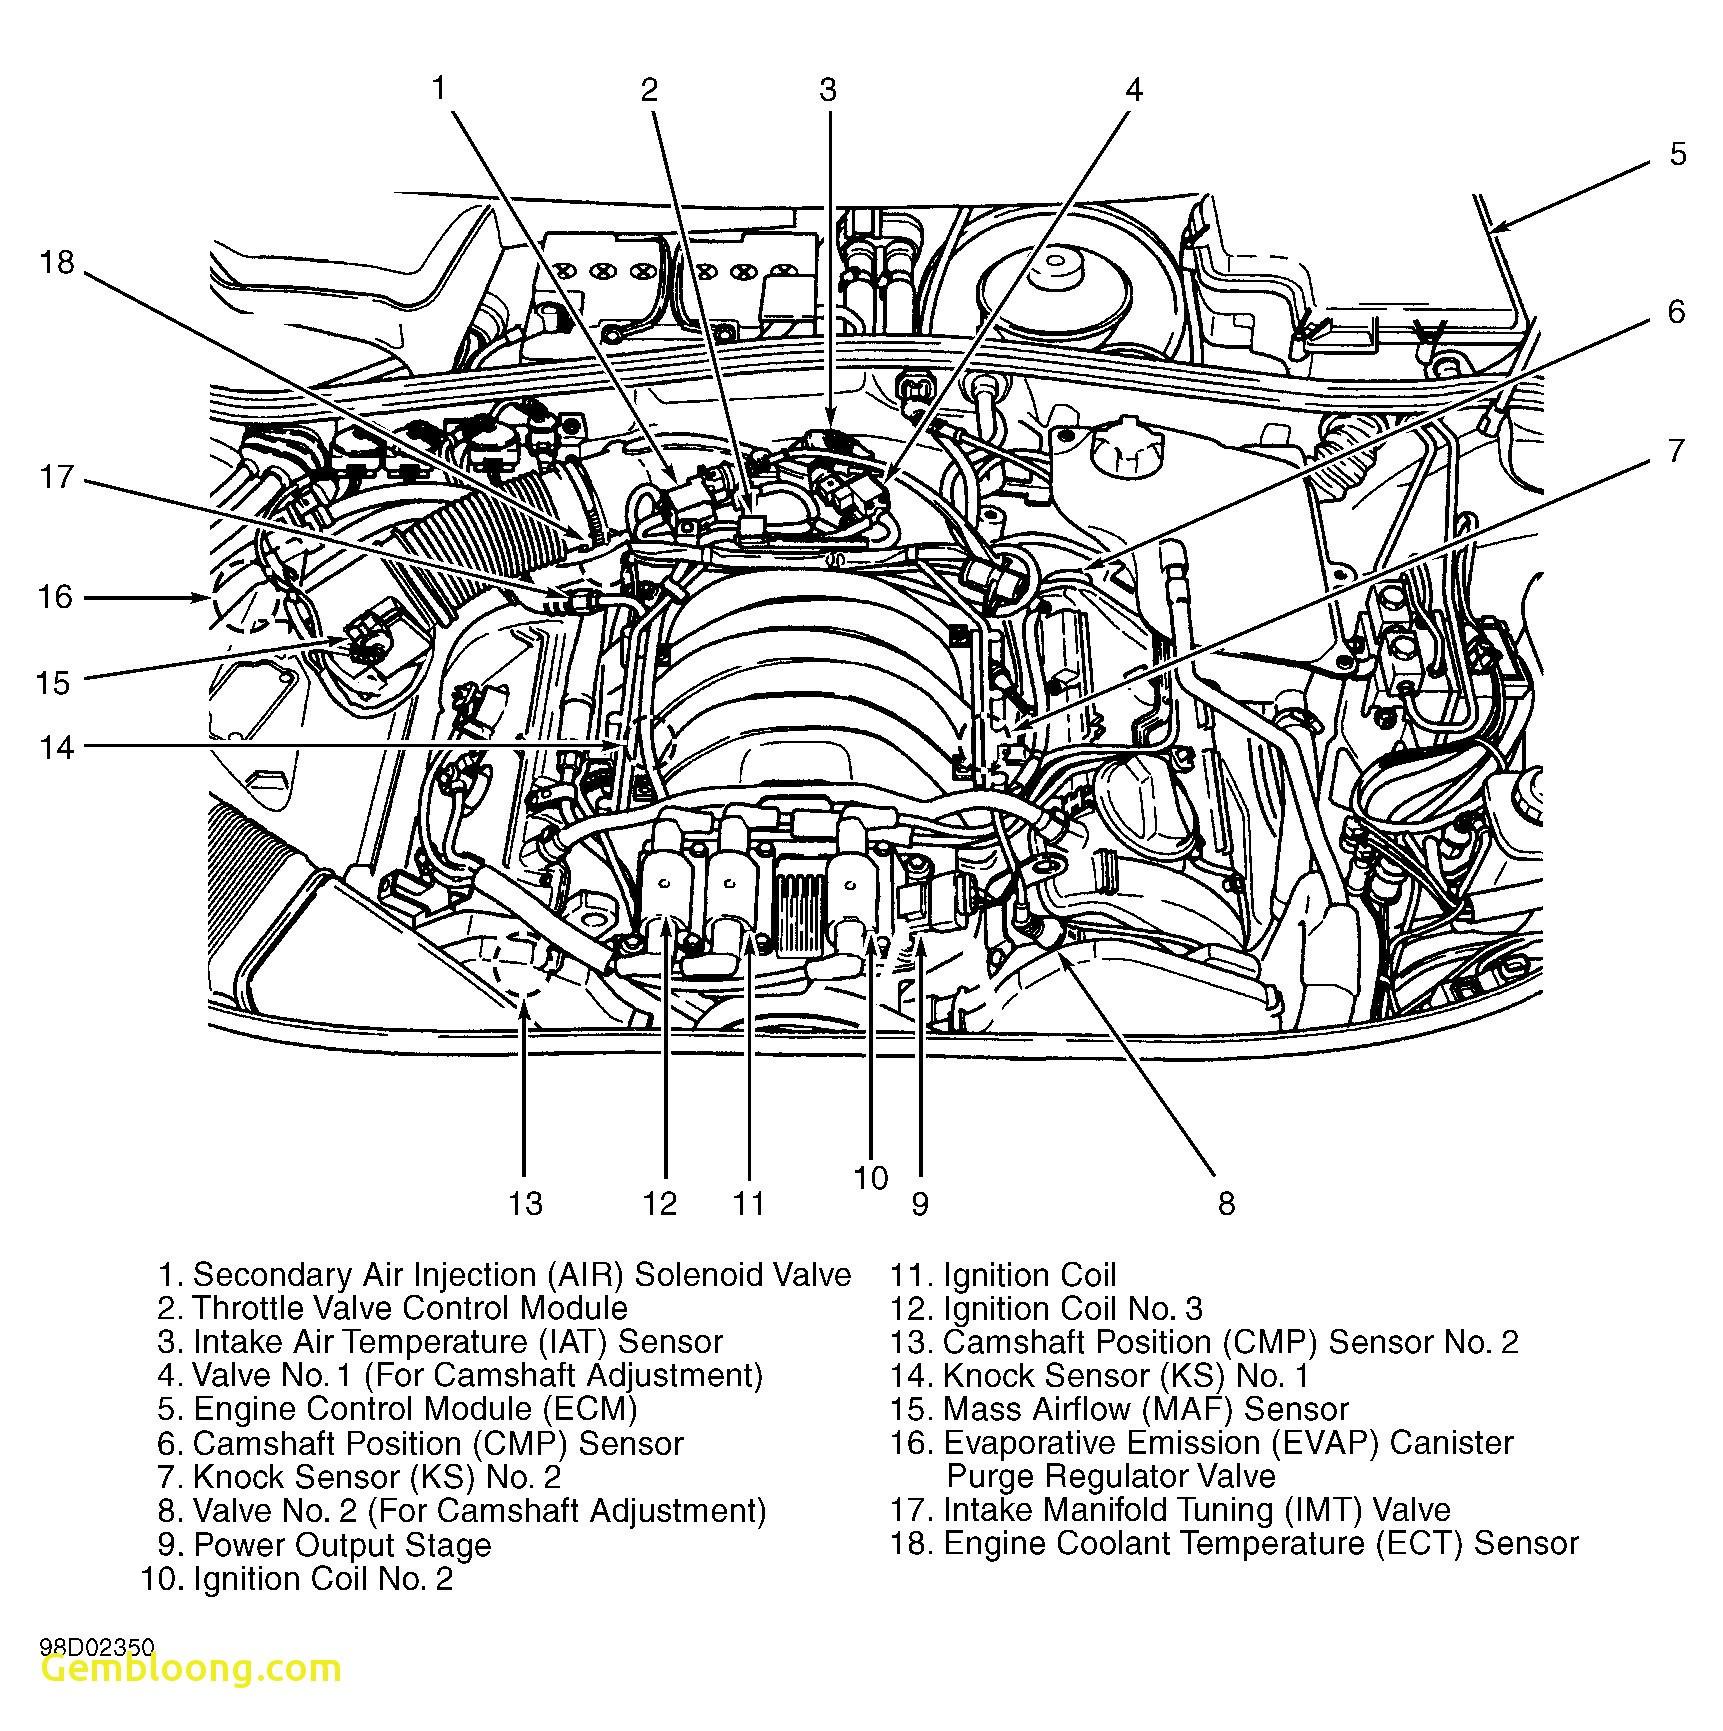 2001 Dodge Caravan Engine Diagram 33 Dodge 2002 Engine Diagram Wiring Diagram Paper Of 2001 Dodge Caravan Engine Diagram